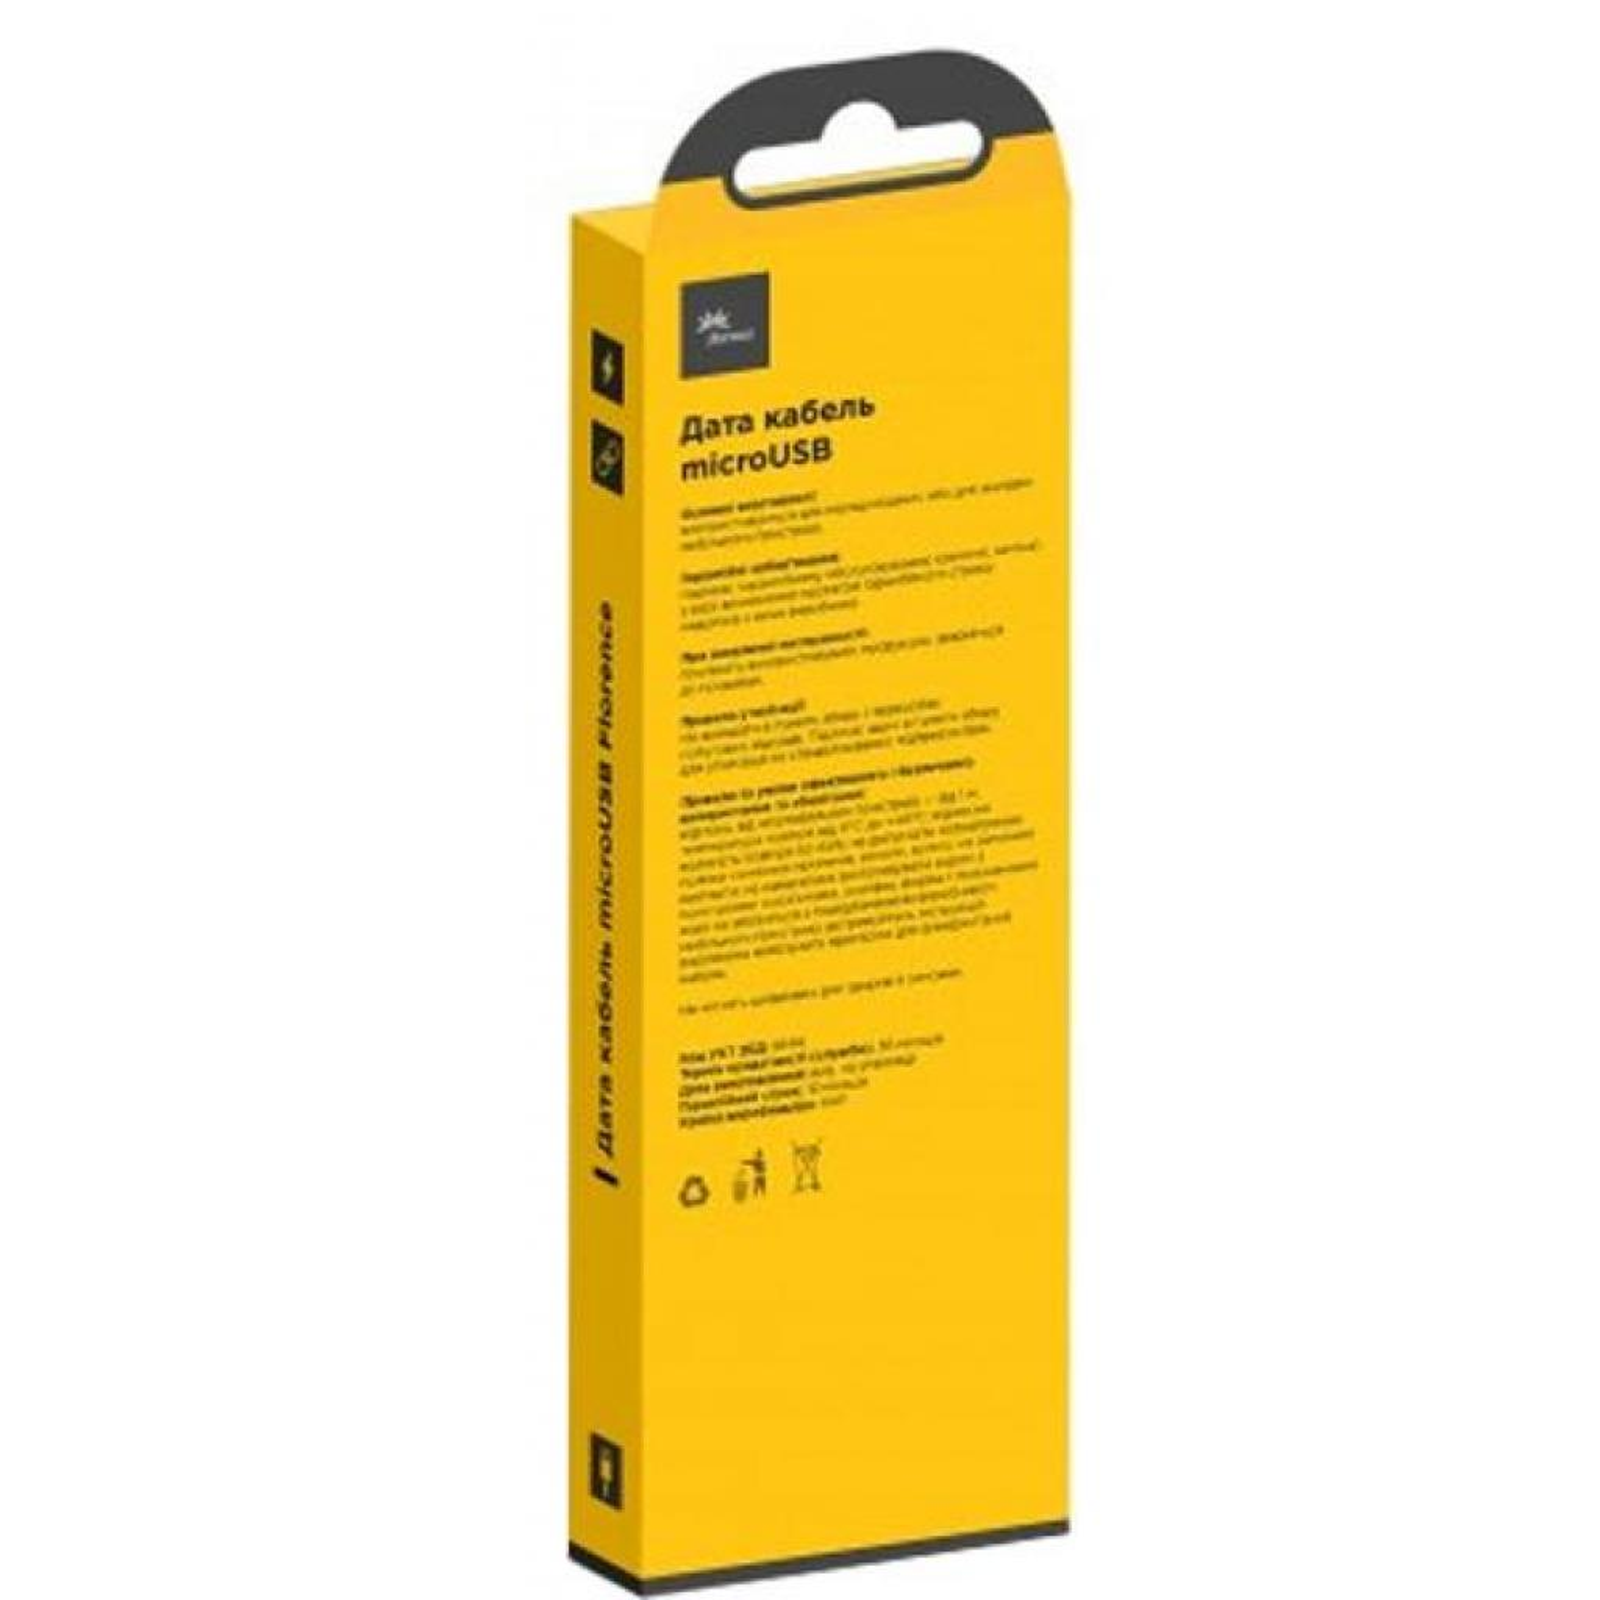 Дата кабель USB 2.0 AM to Micro 5P 0.2m Black Florence (FD-M02-1B) изображение 2